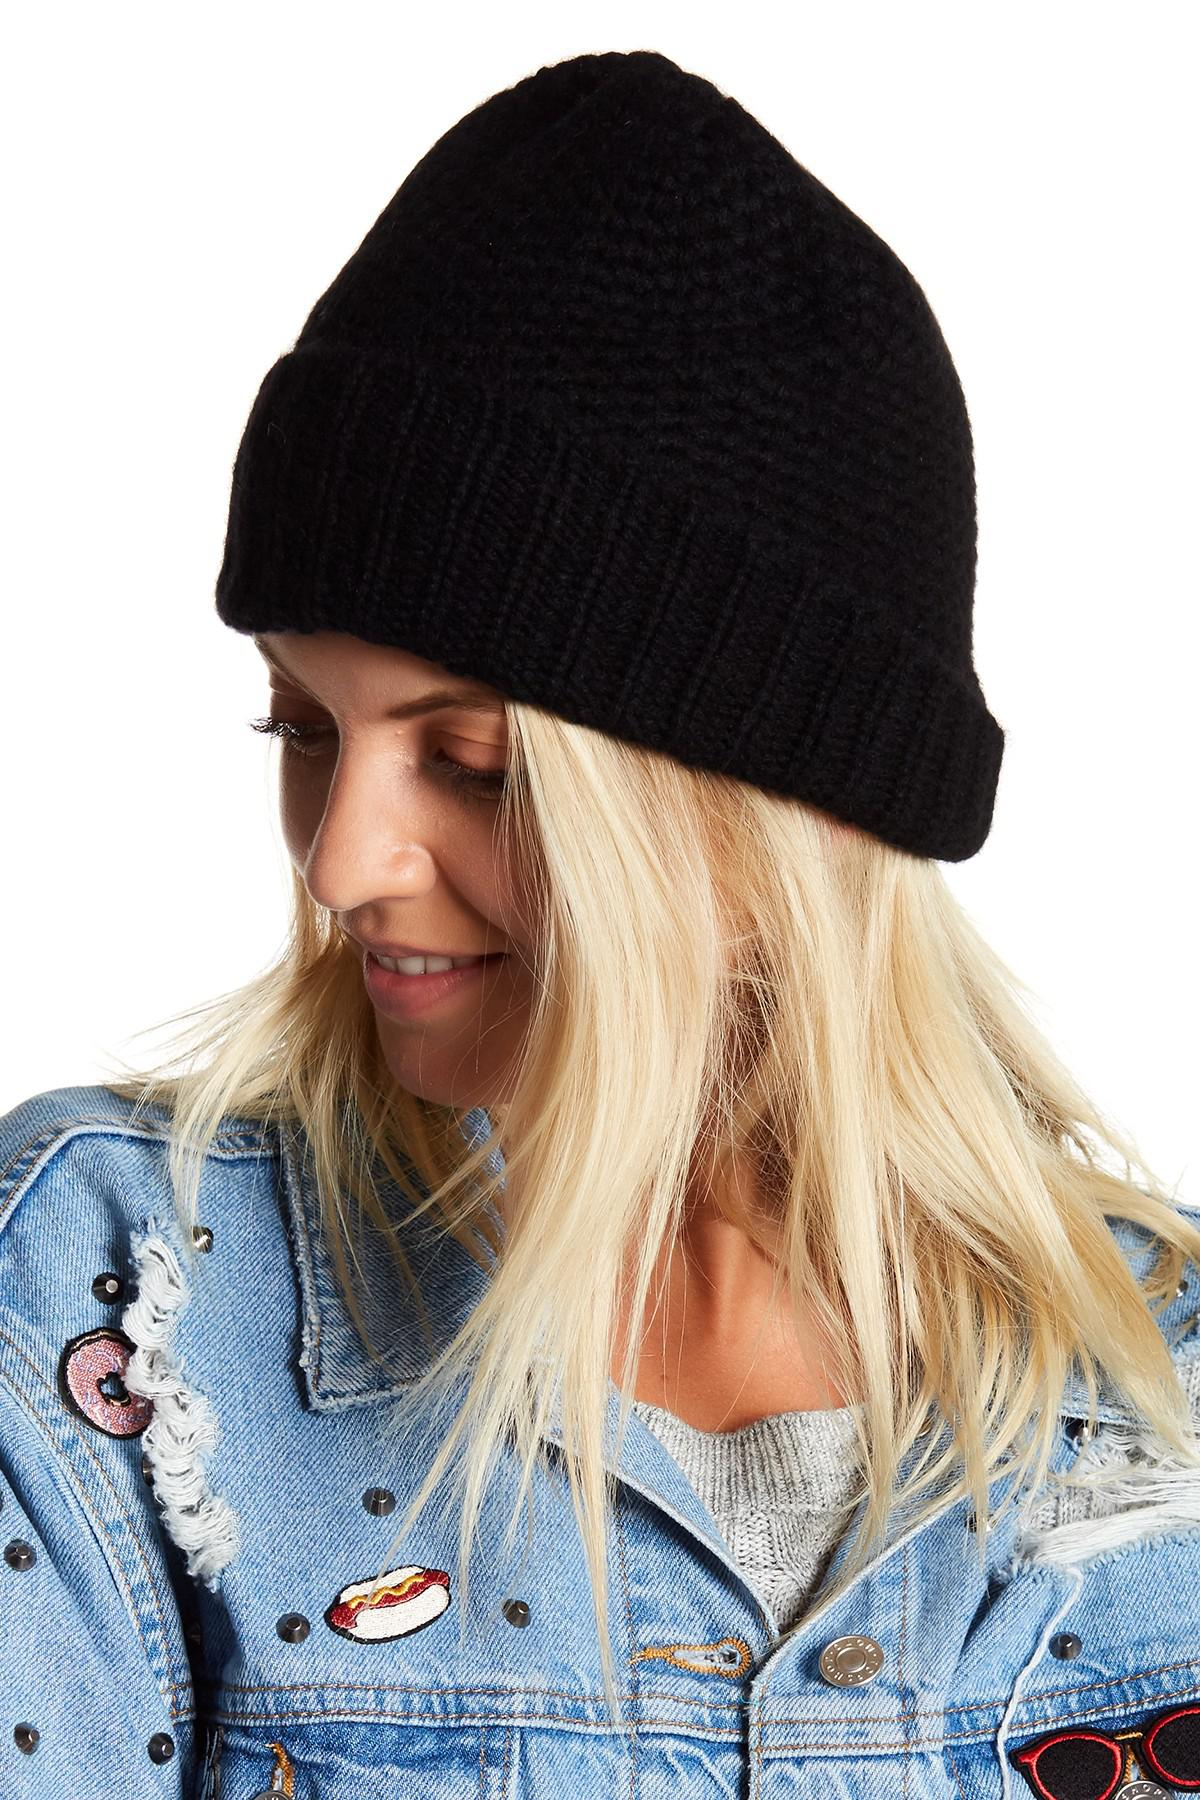 Lyst - Skull Cashmere Knit Cashmere Beanie in Black ec18ebafae9